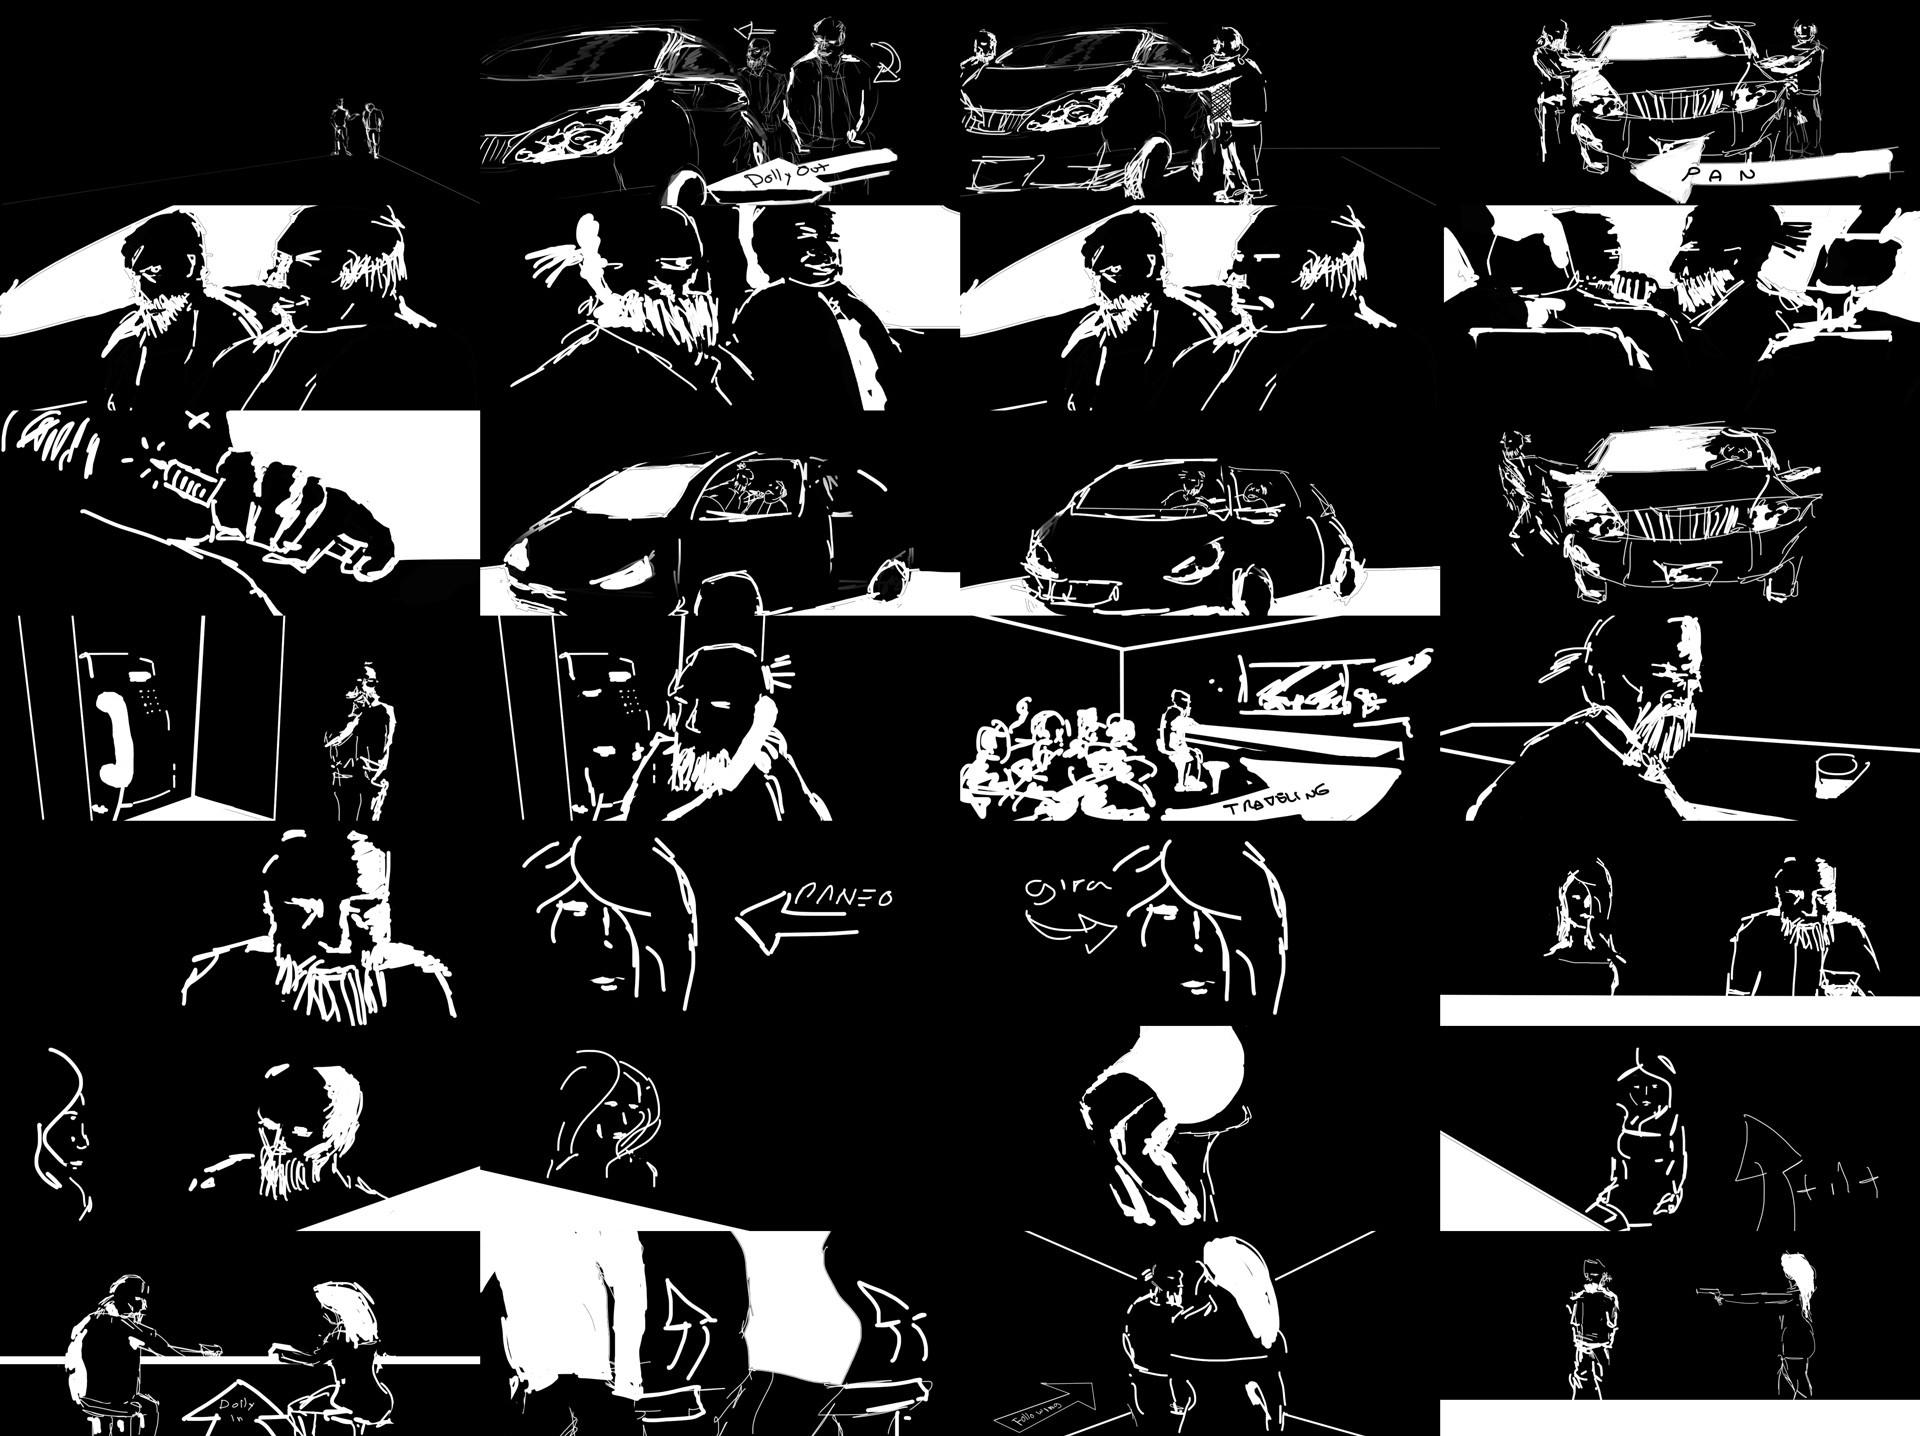 Dorian rodriguez storyboard small